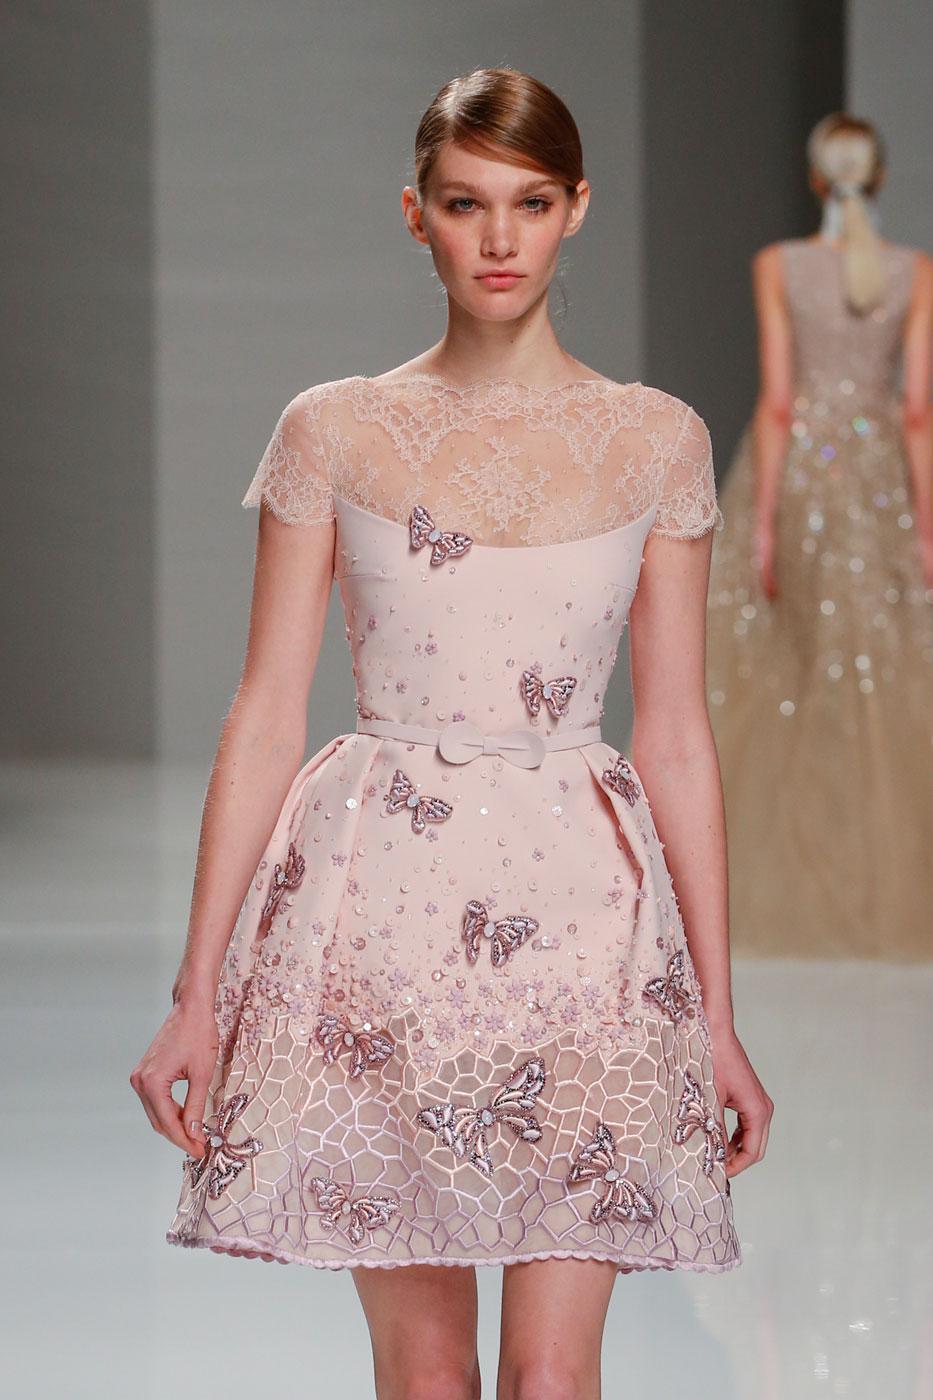 Georges-Hobeika-fashion-runway-show-haute-couture-paris-spring-2015-the-impression-58